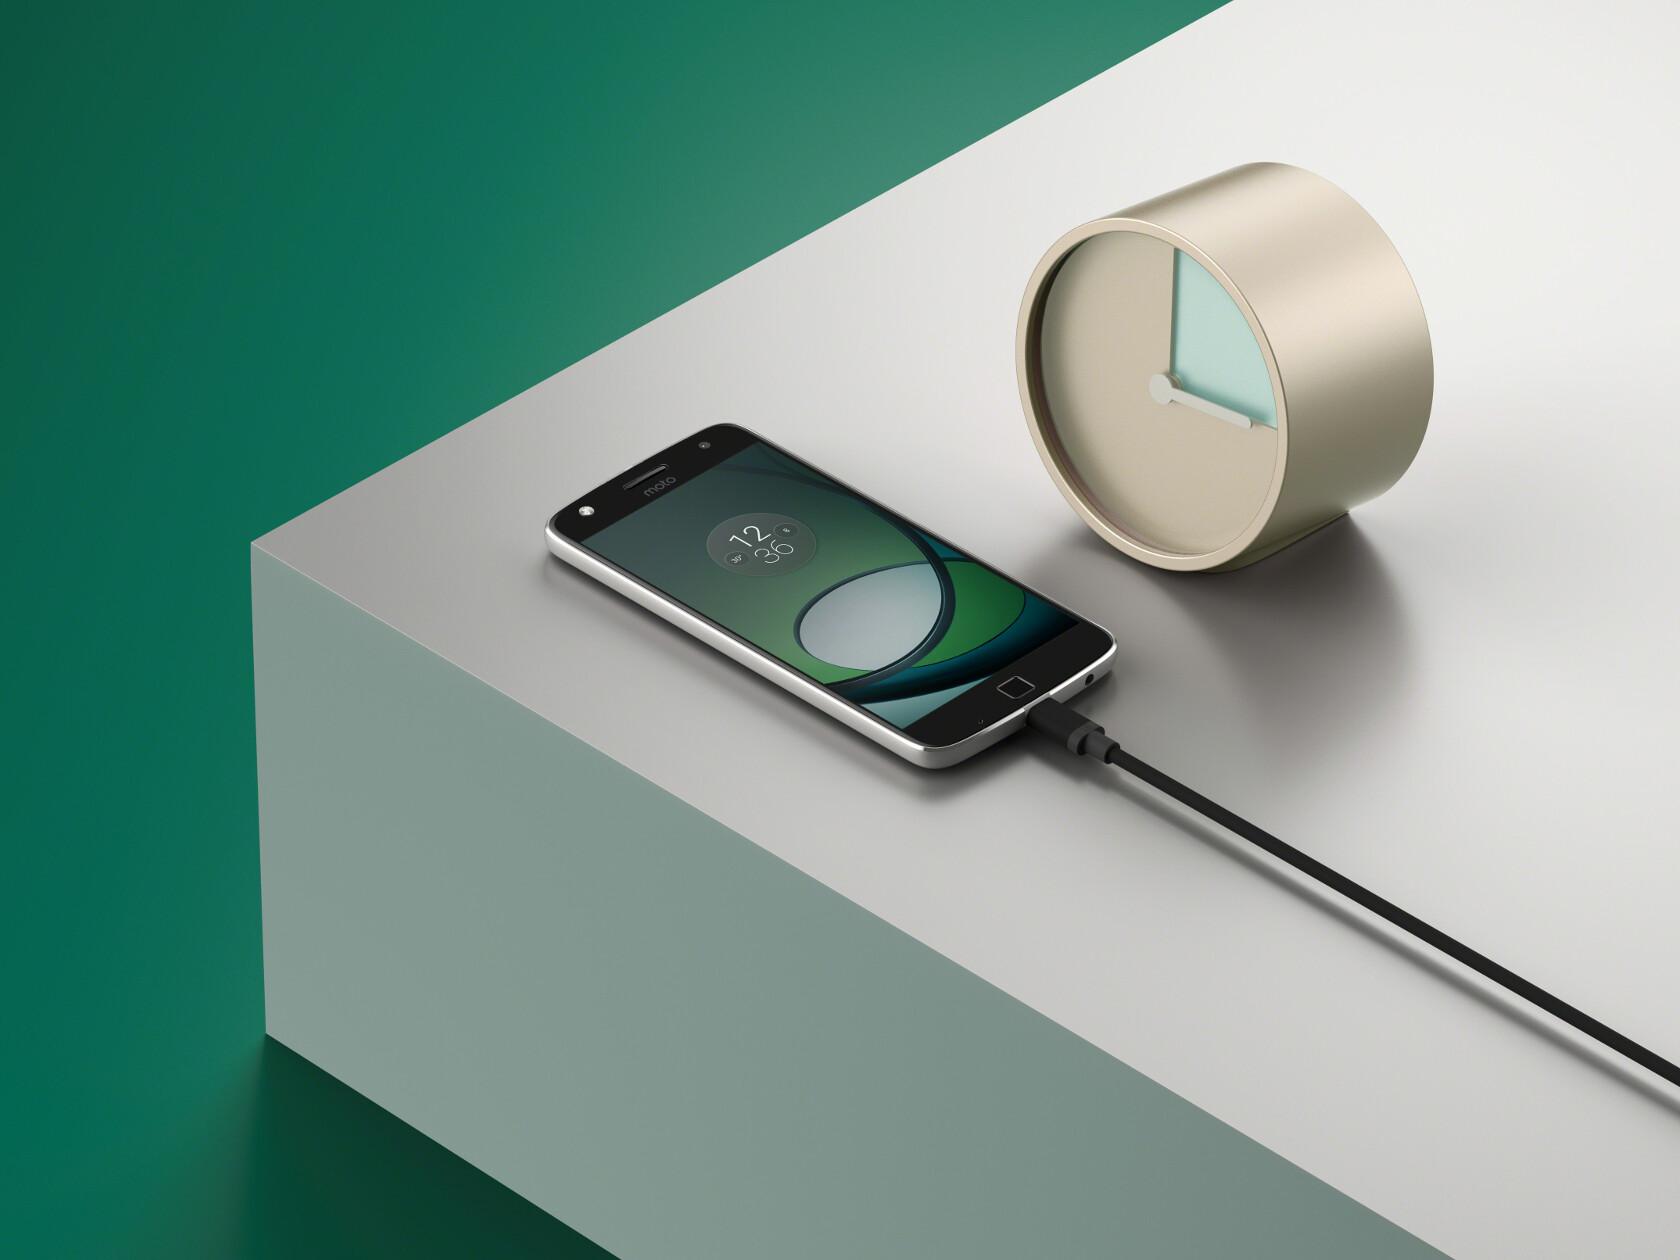 Unlocked Motorola Moto Z and Moto Z Play price and release ...